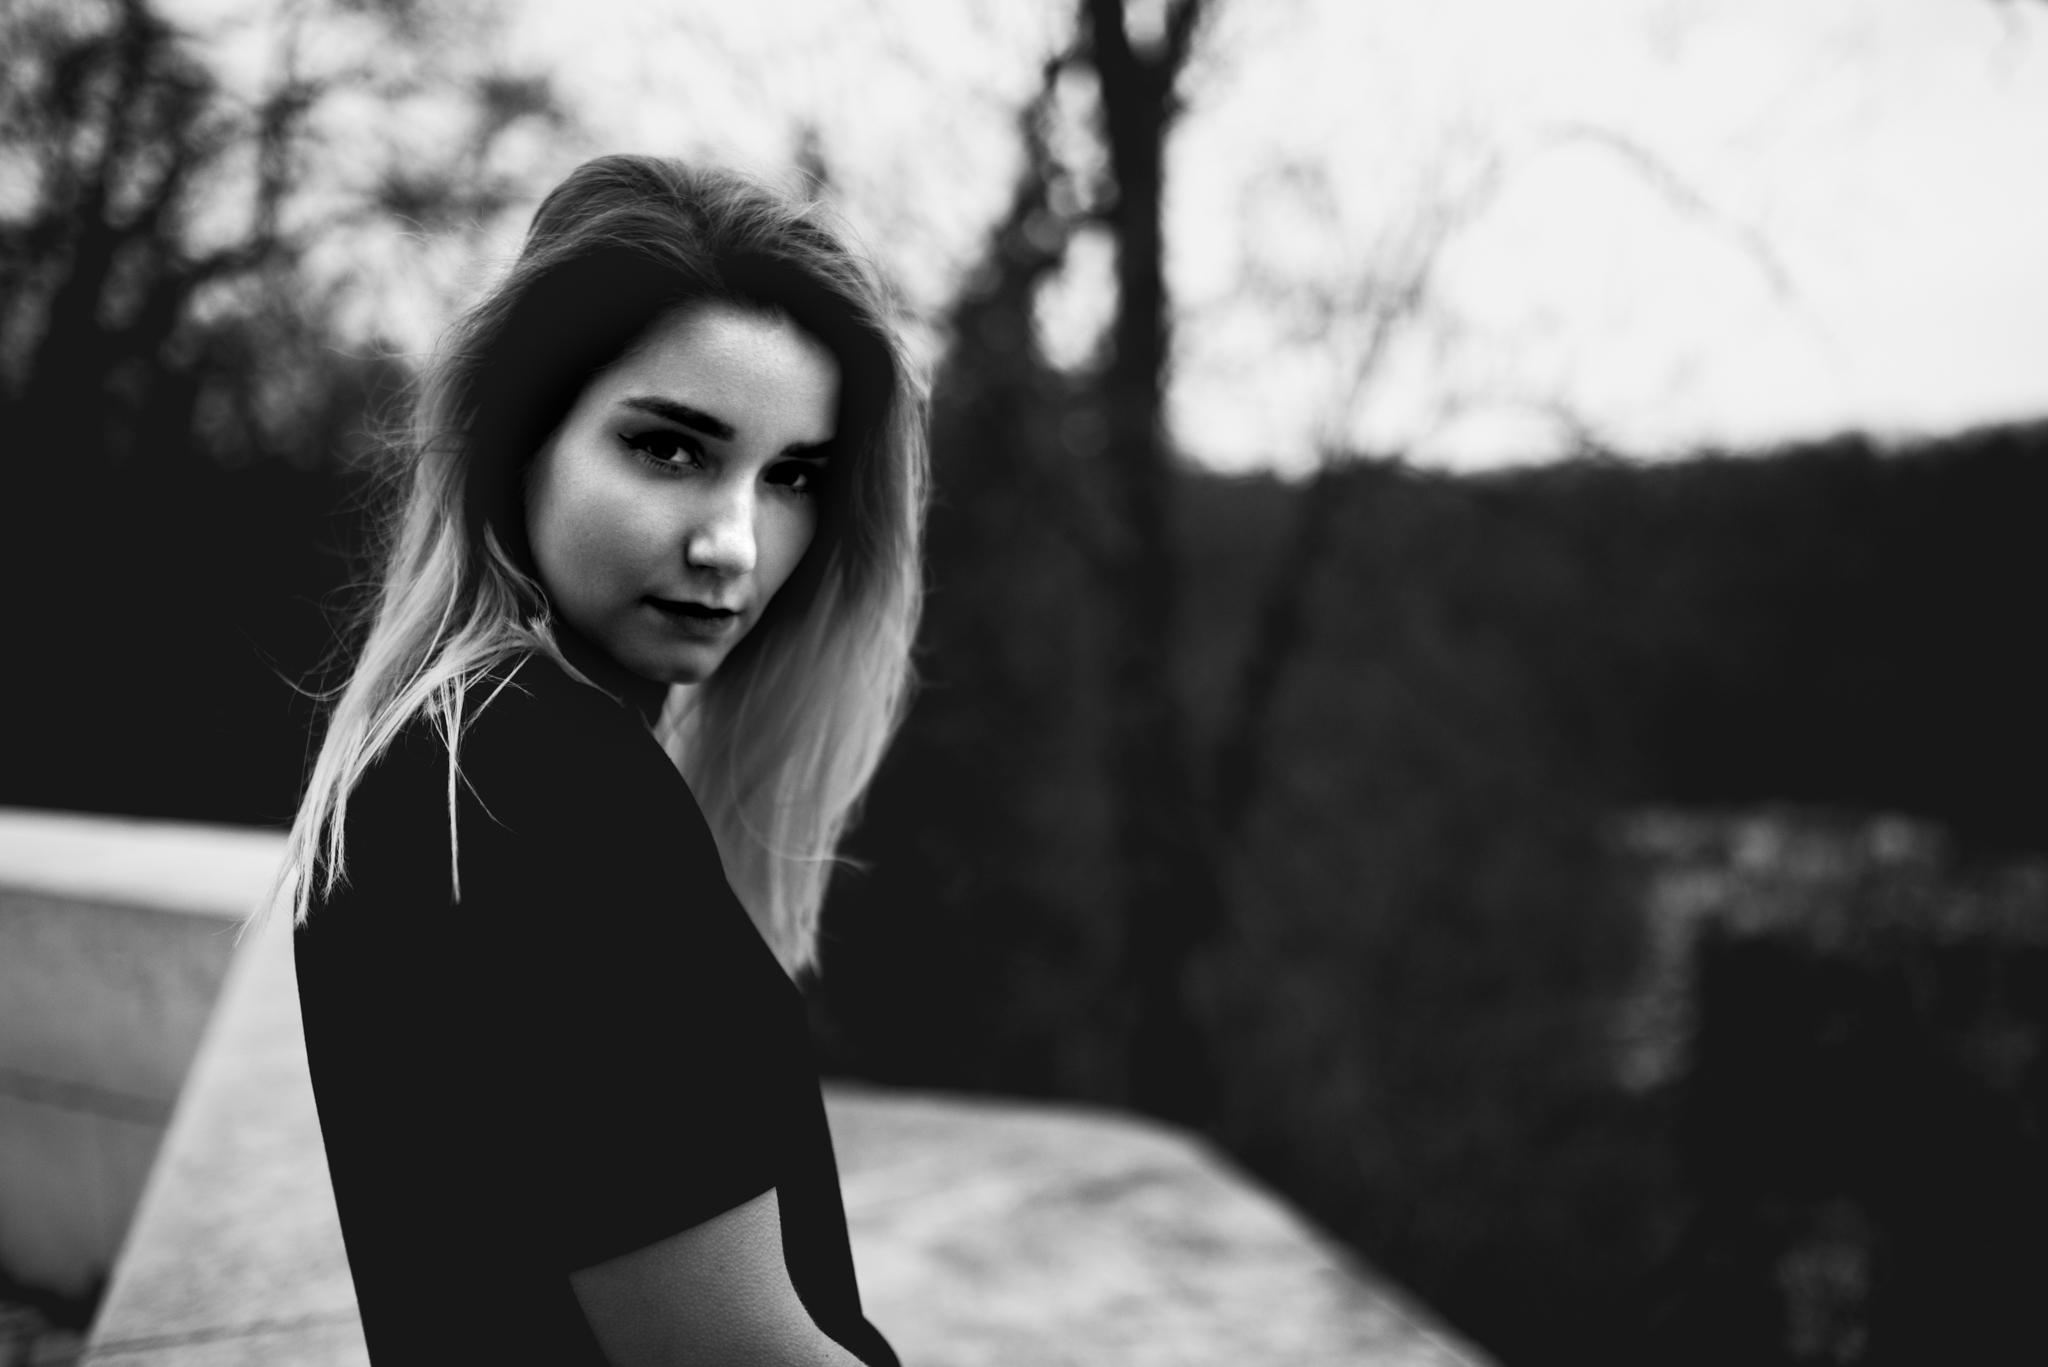 Photographie – C. Som